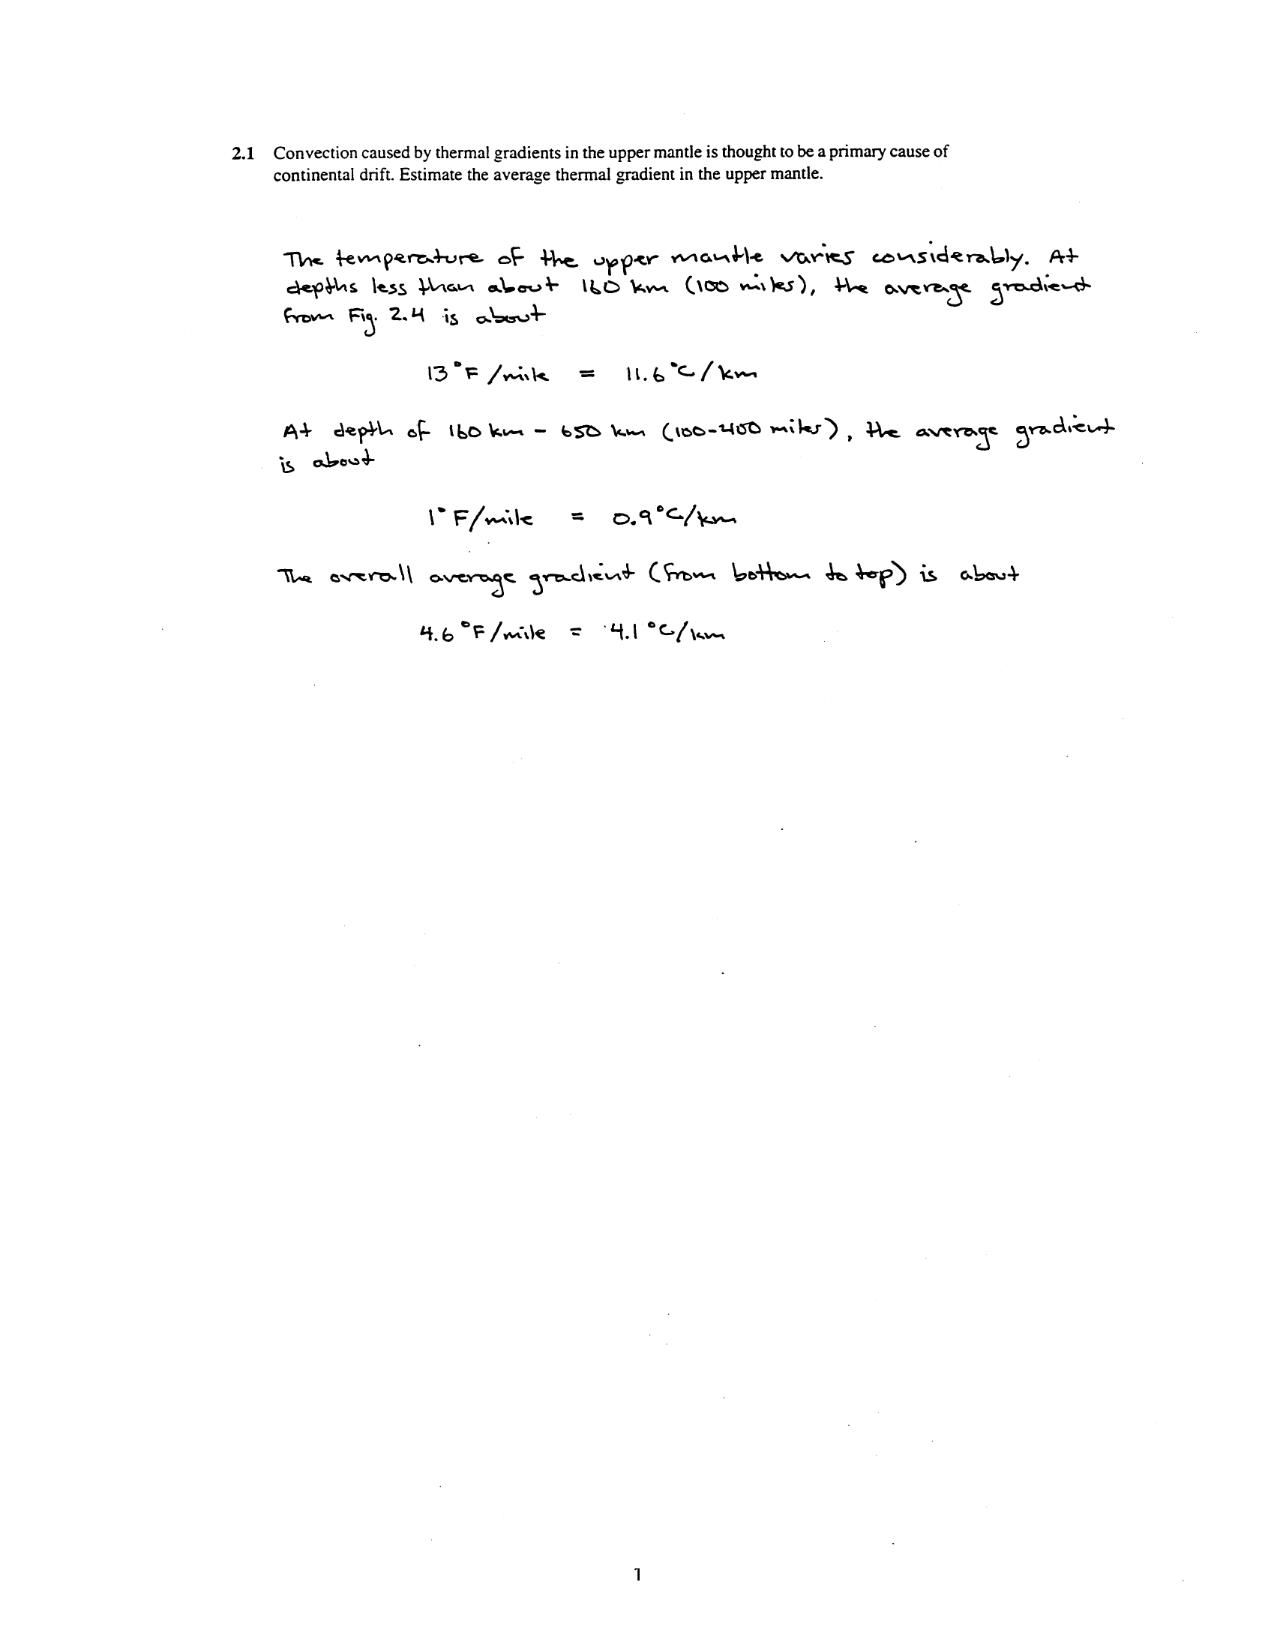 download free geotechnical earthquake engineering Kramer solution manual & answers eBook pdf | Gioumeh.com Steven L. Kramer